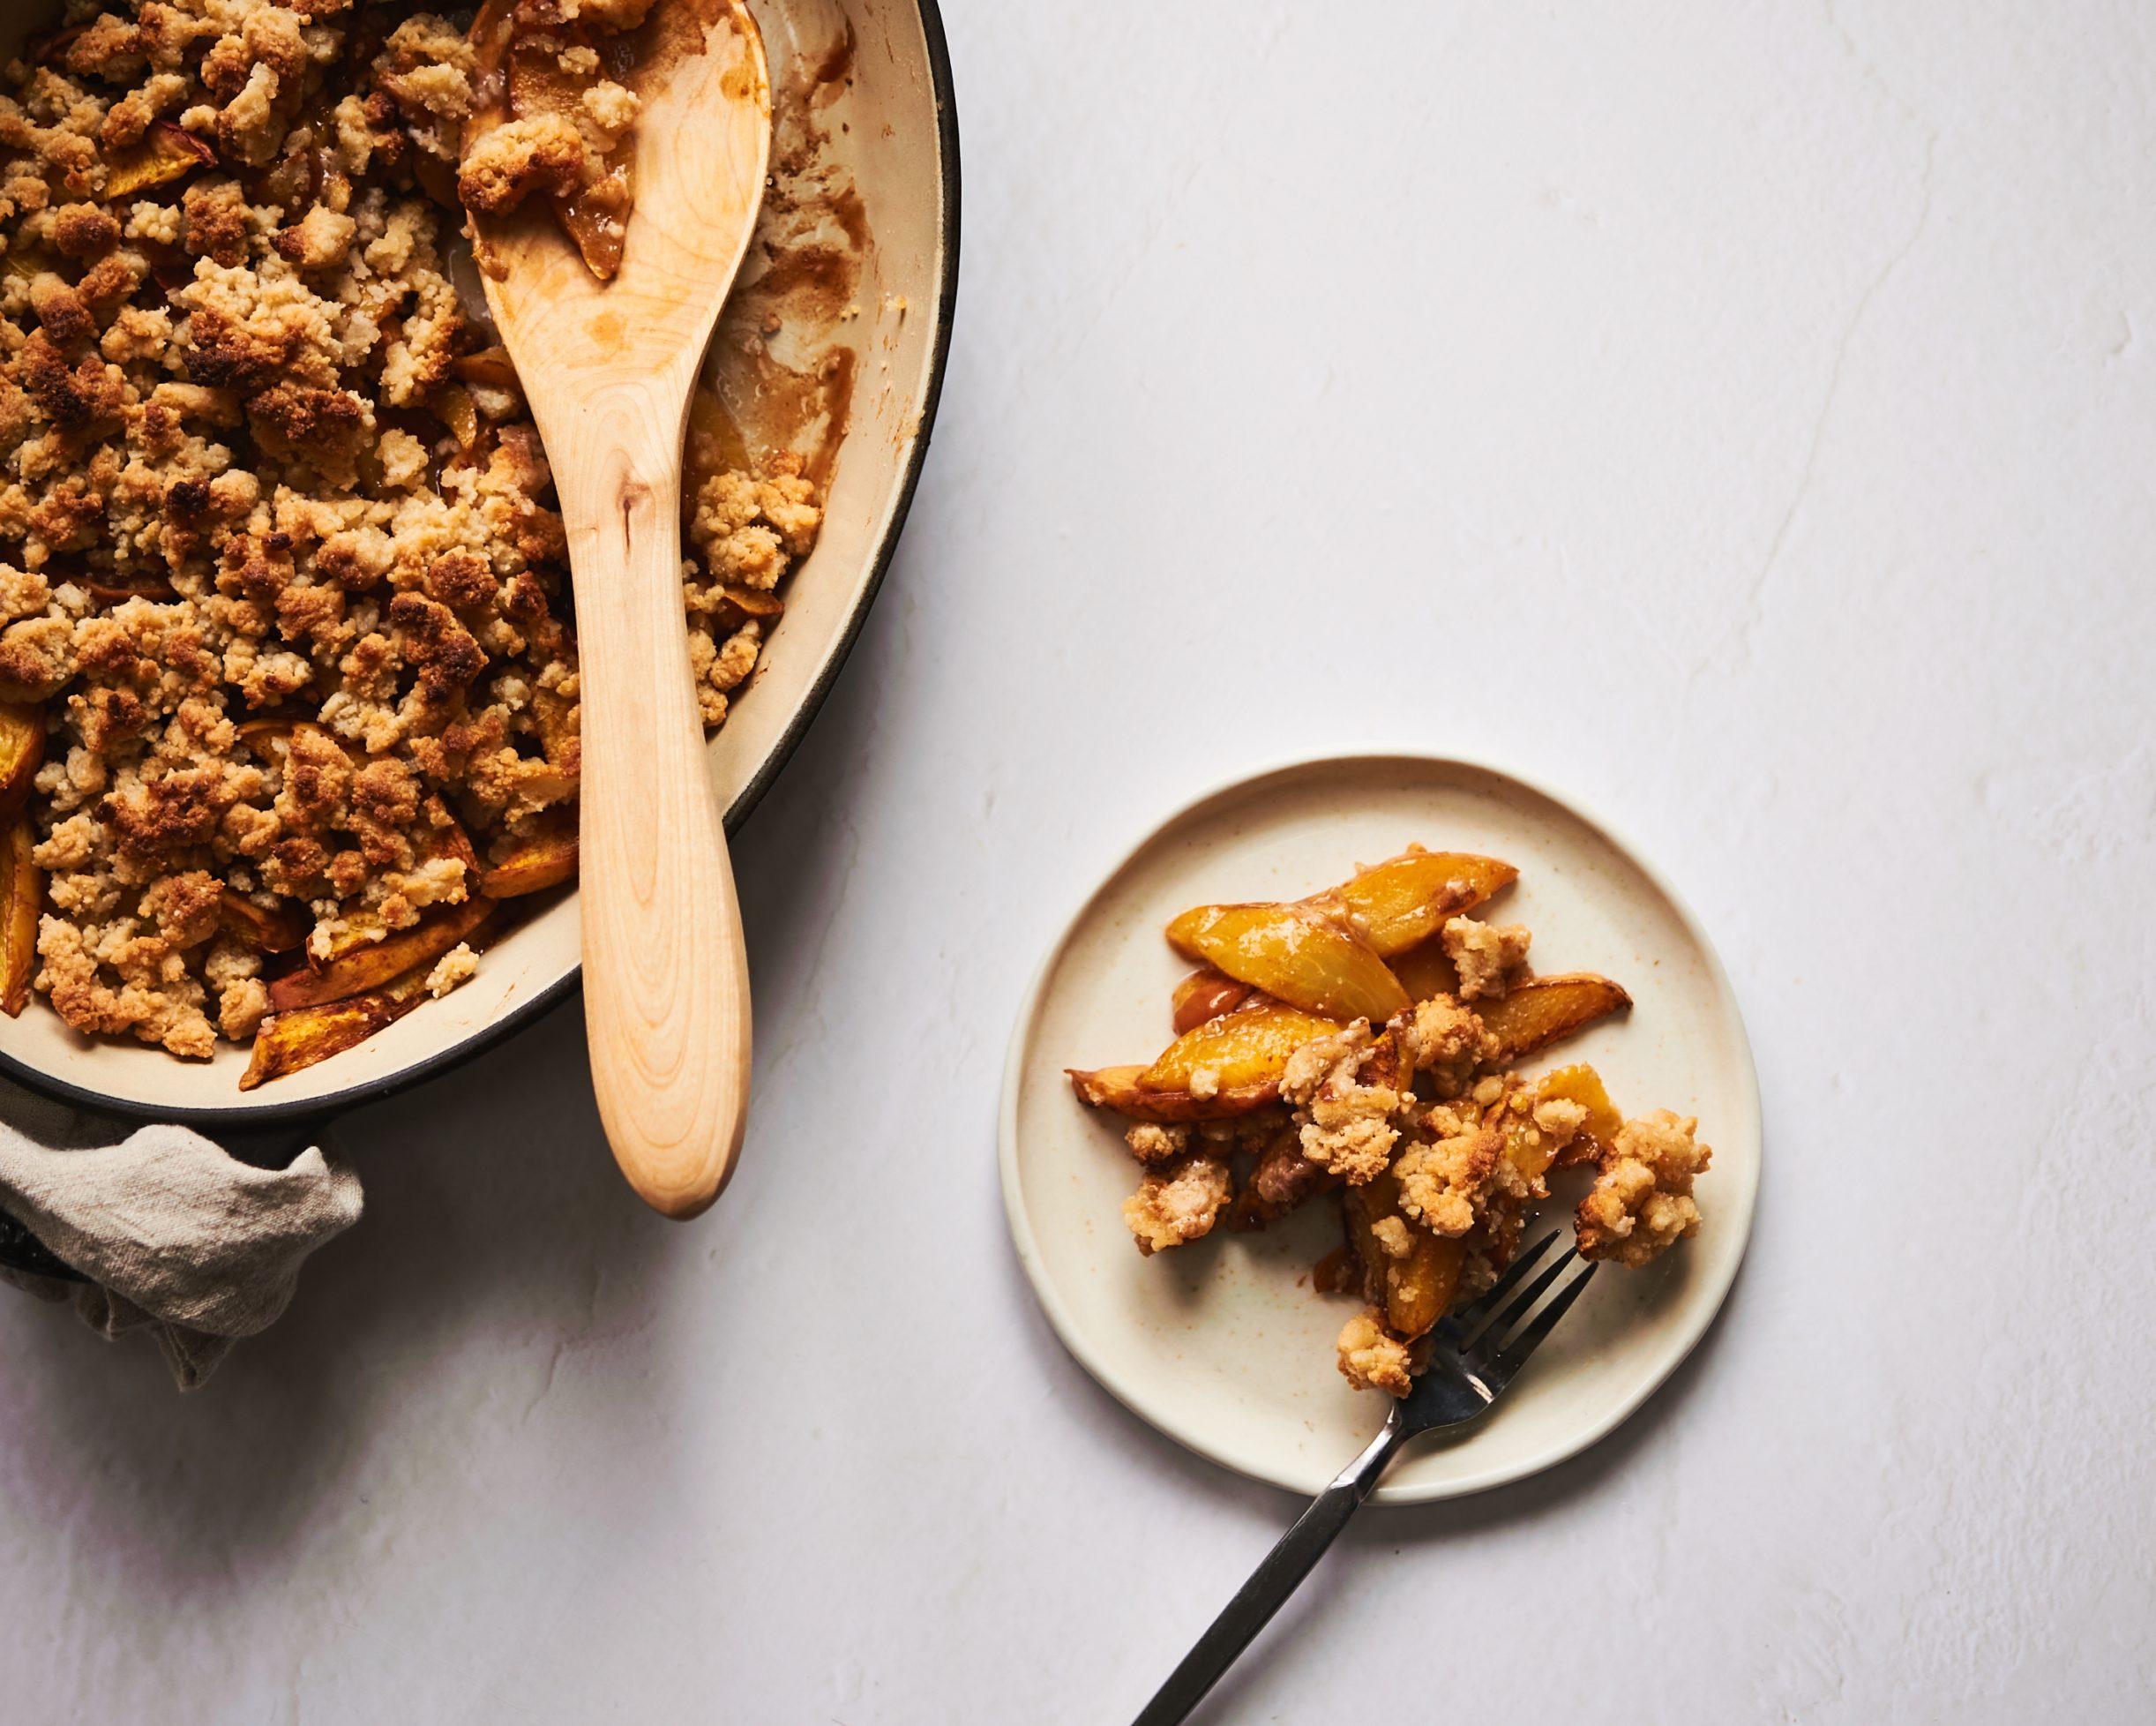 This peach cobbler is gluten free, paleo and sugar free